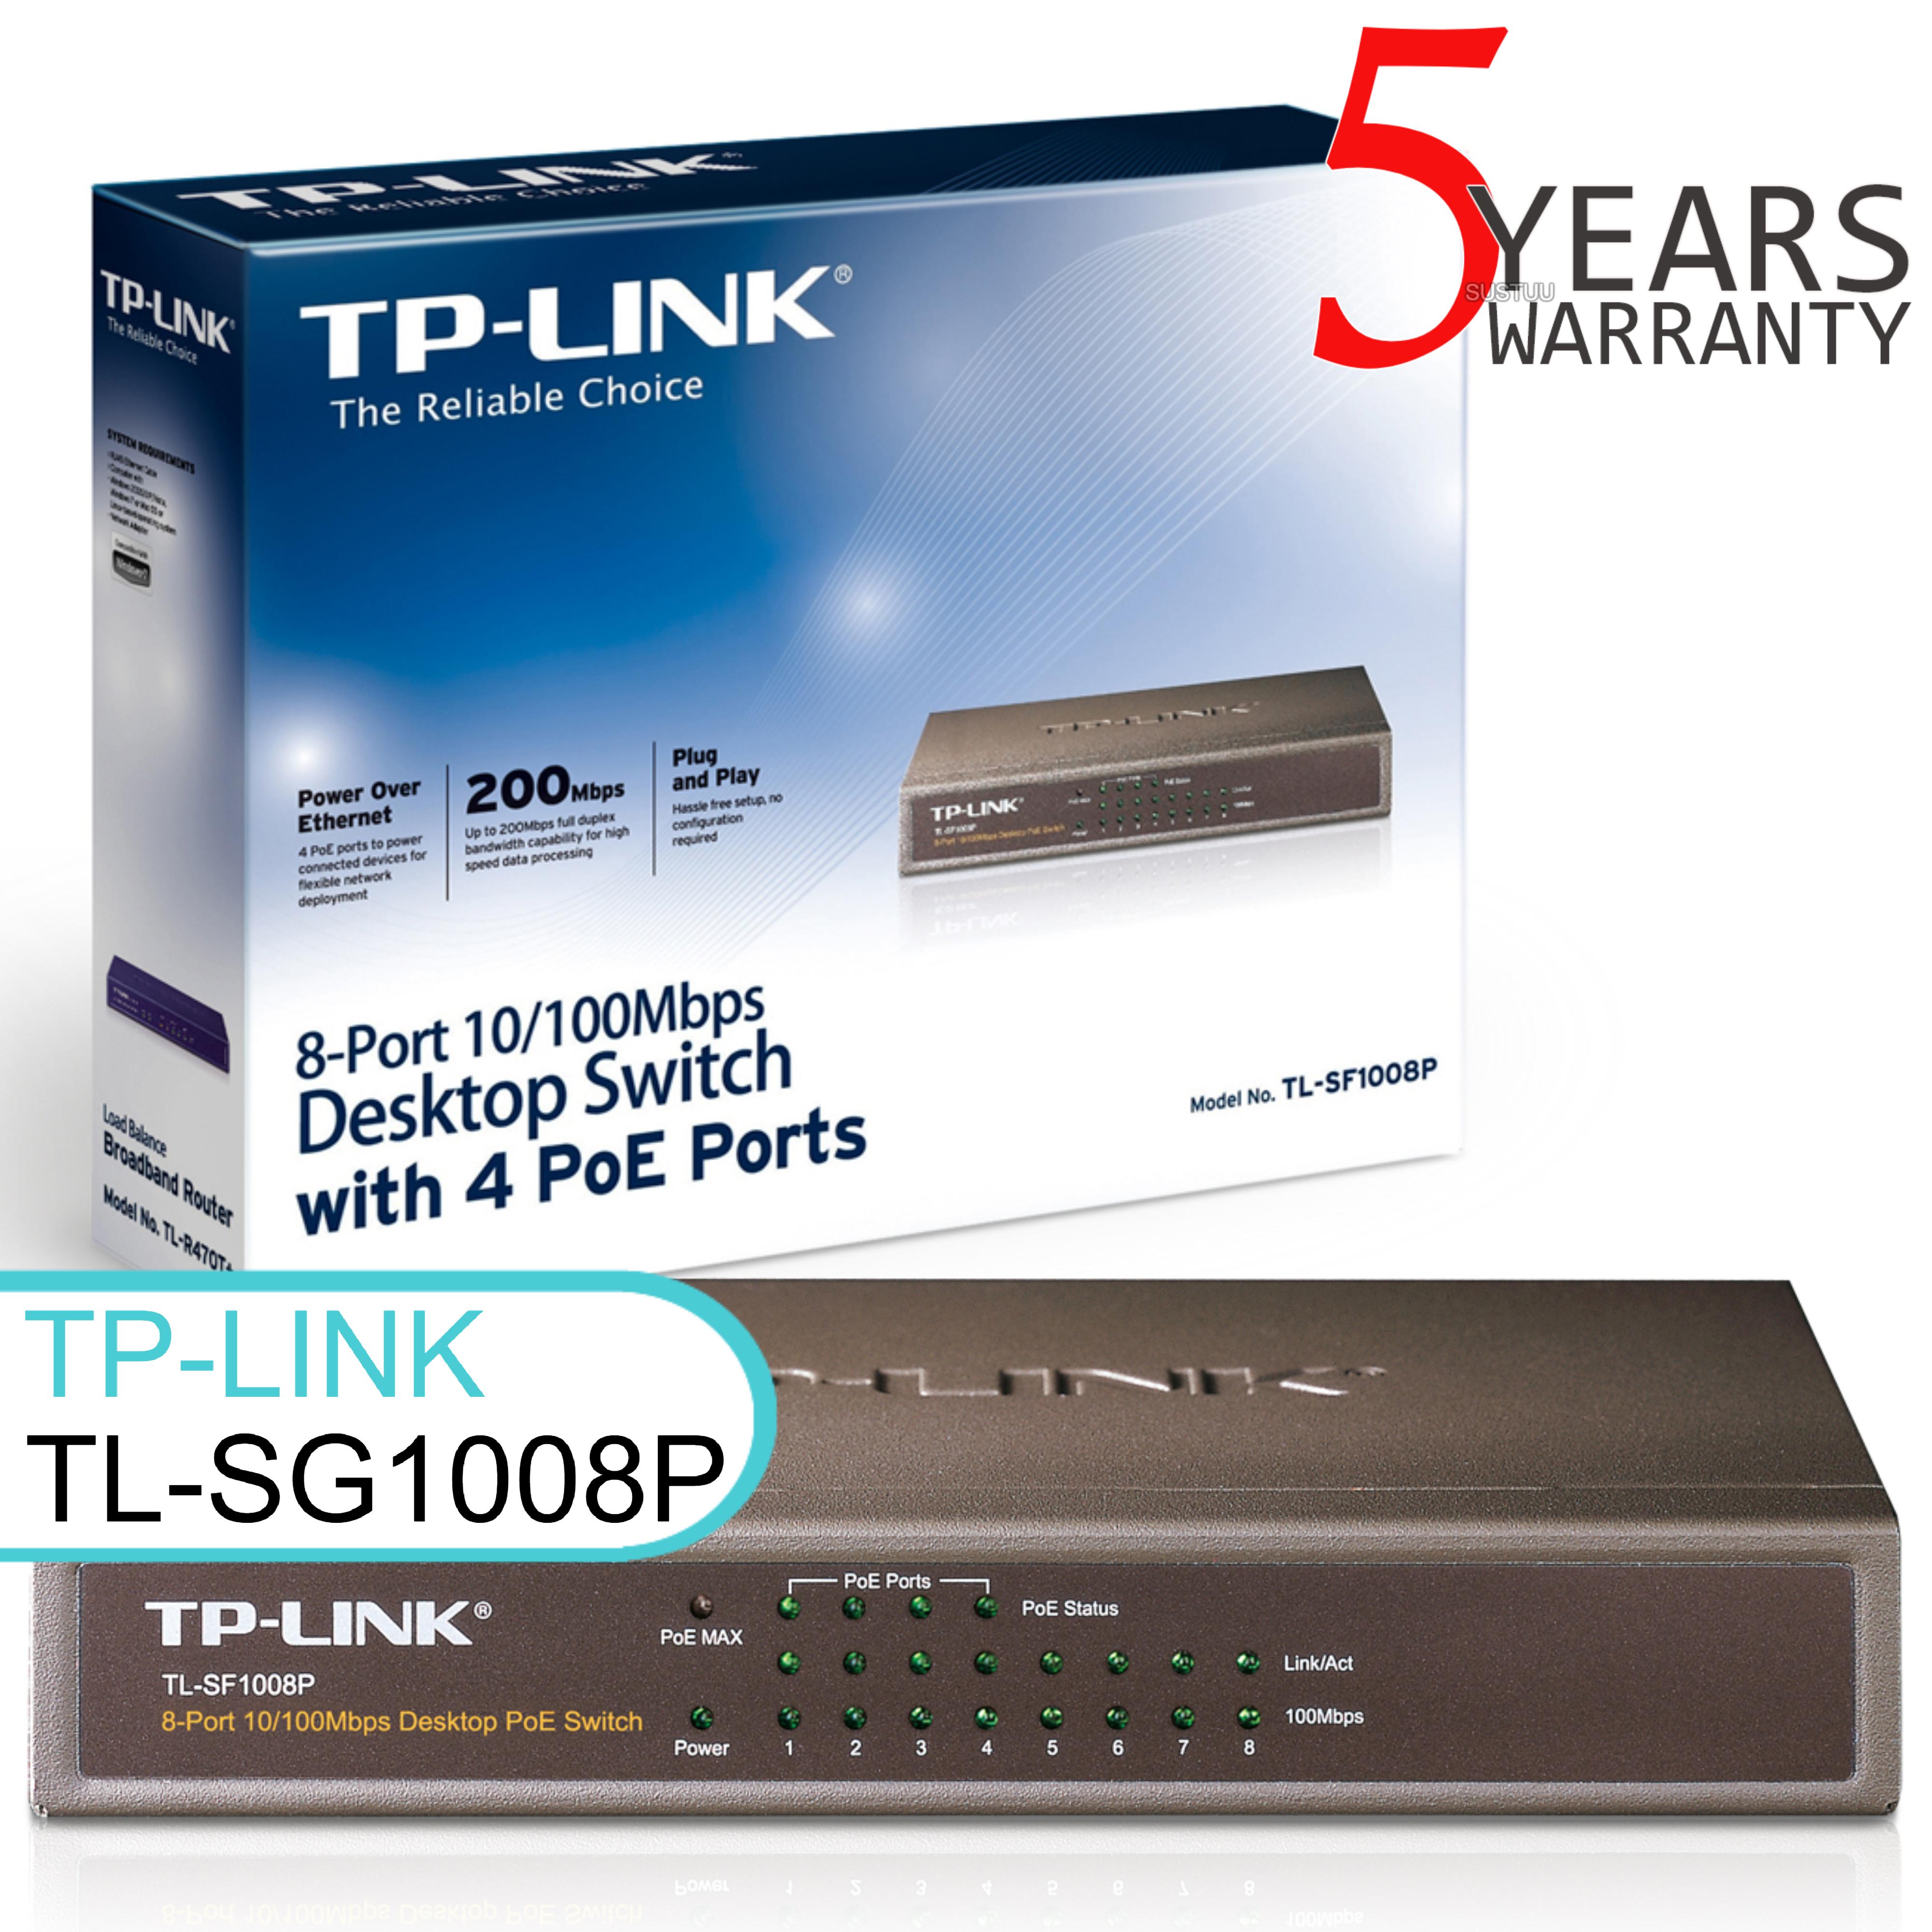 TP-Link TL-SF1008P|8-Port 10/100/1000 Mbps Desktop Switch with 4-Port 15.4W PoE